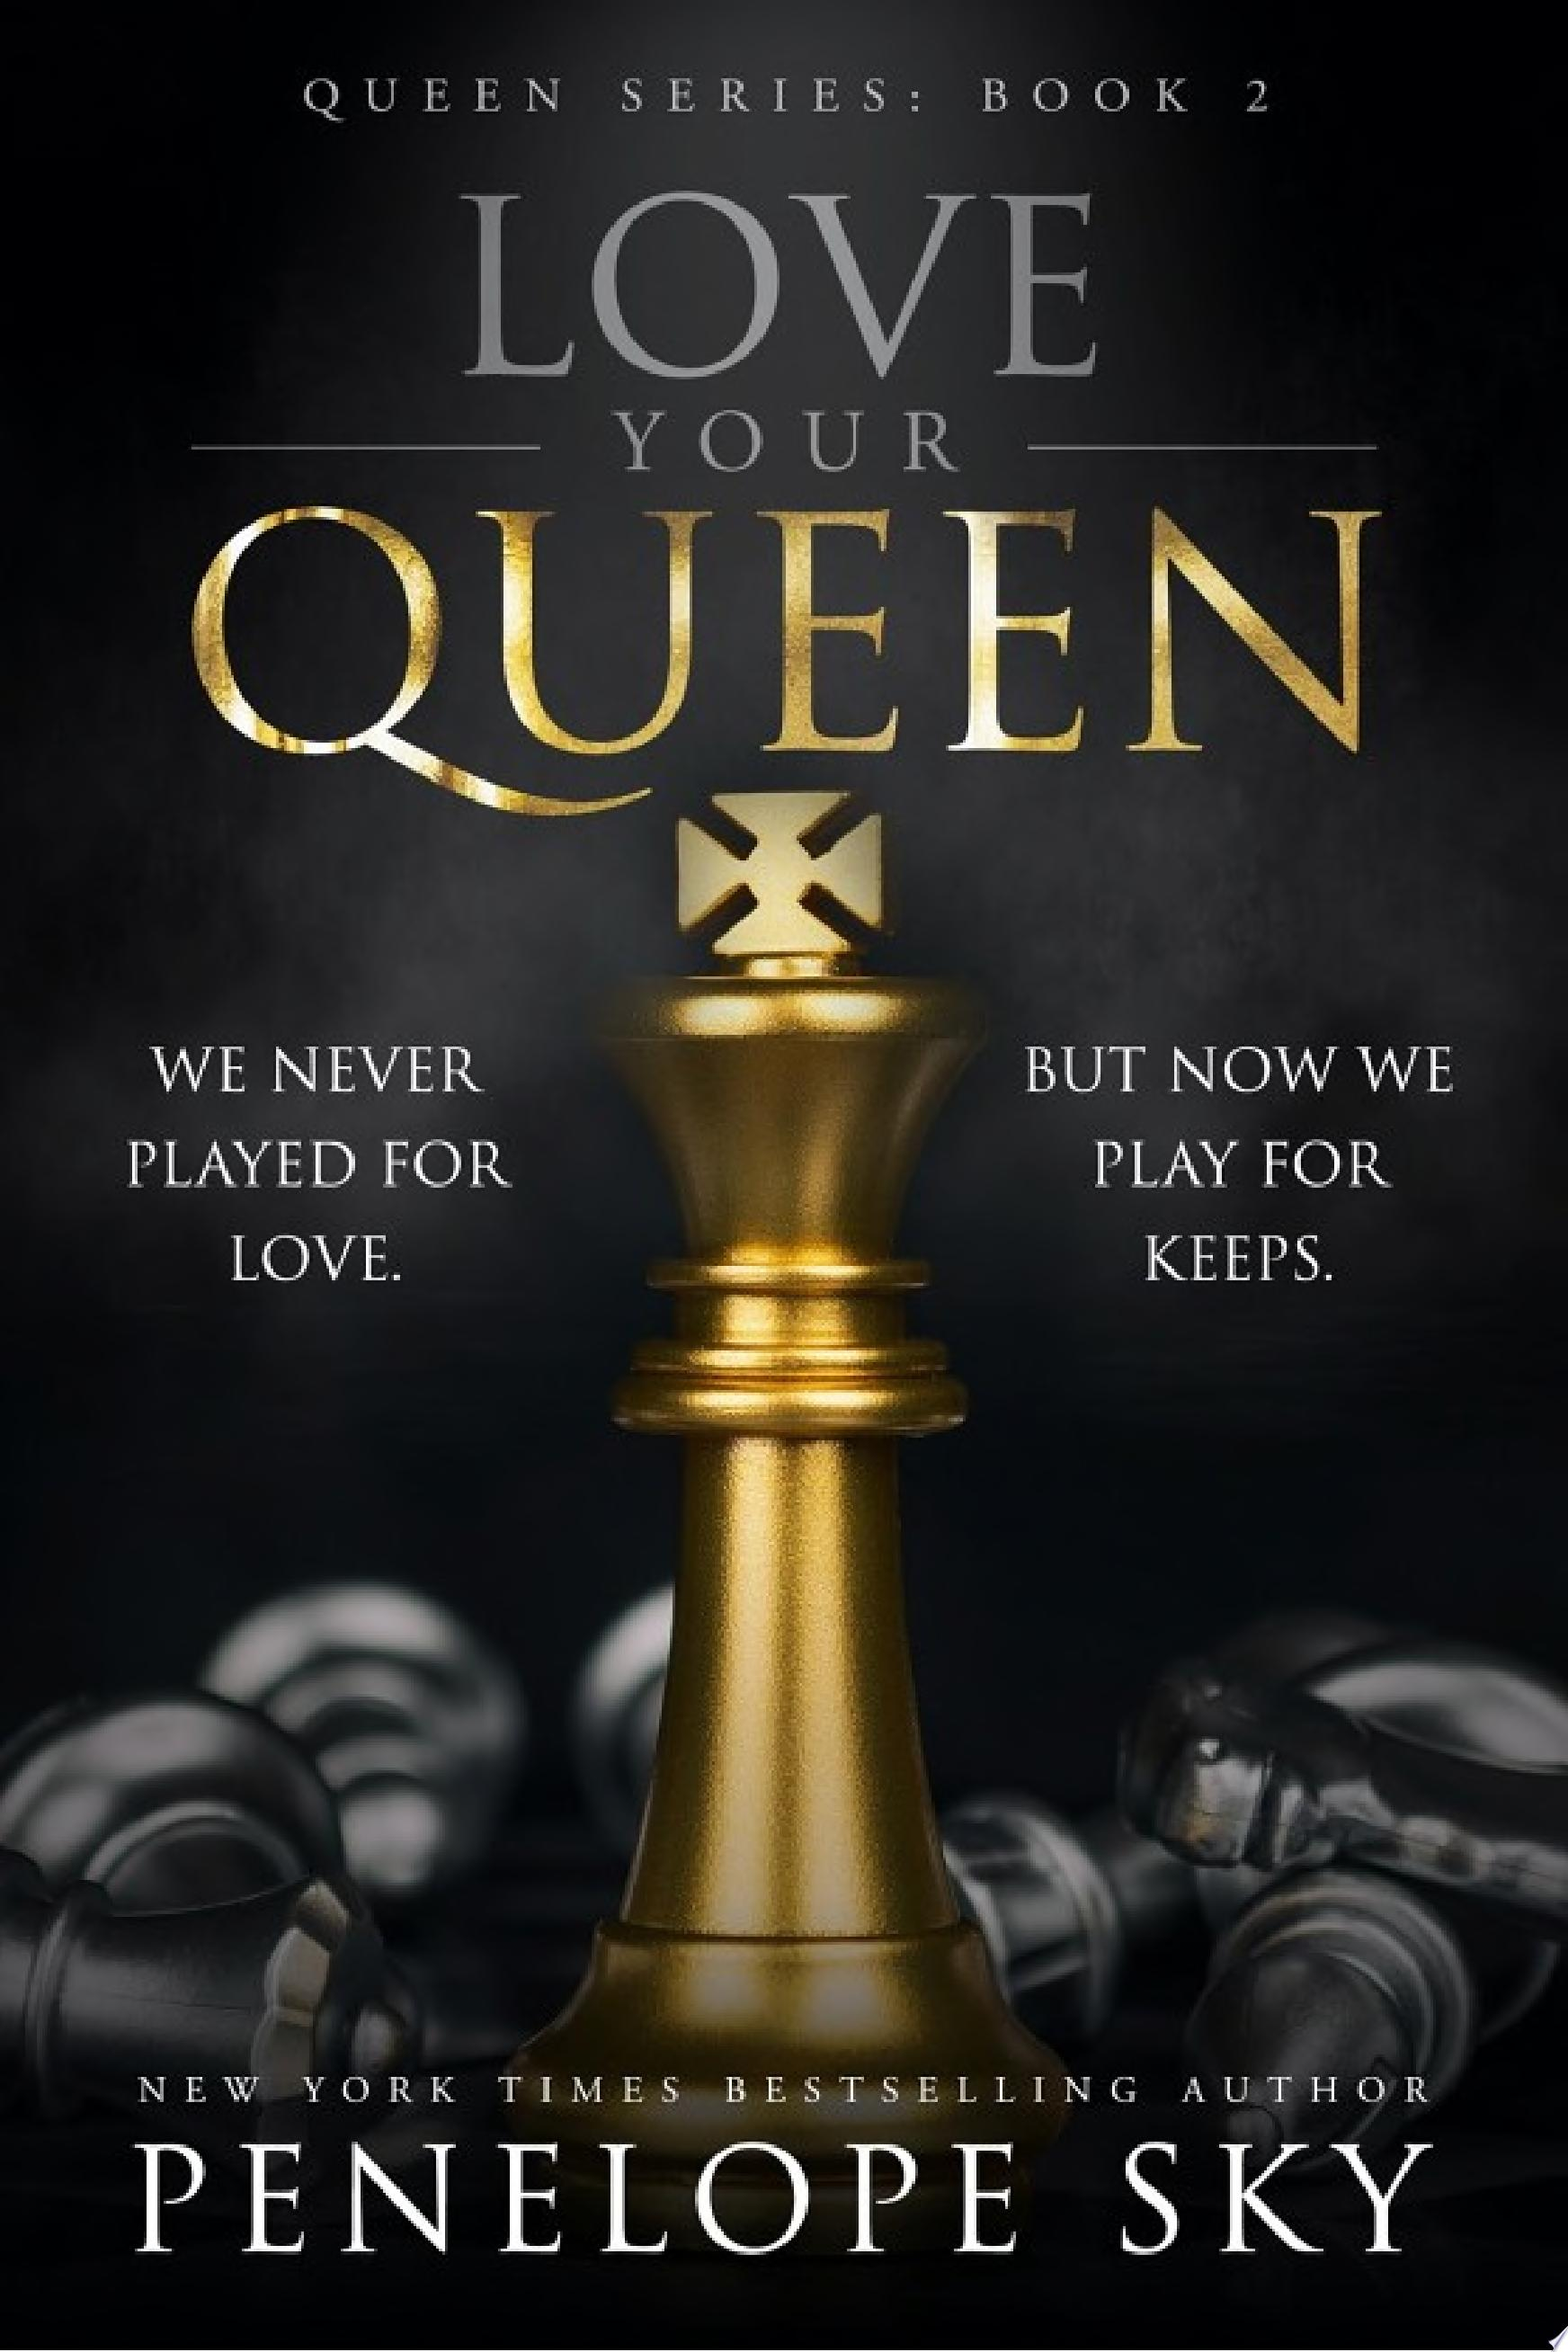 The Scotch Queen